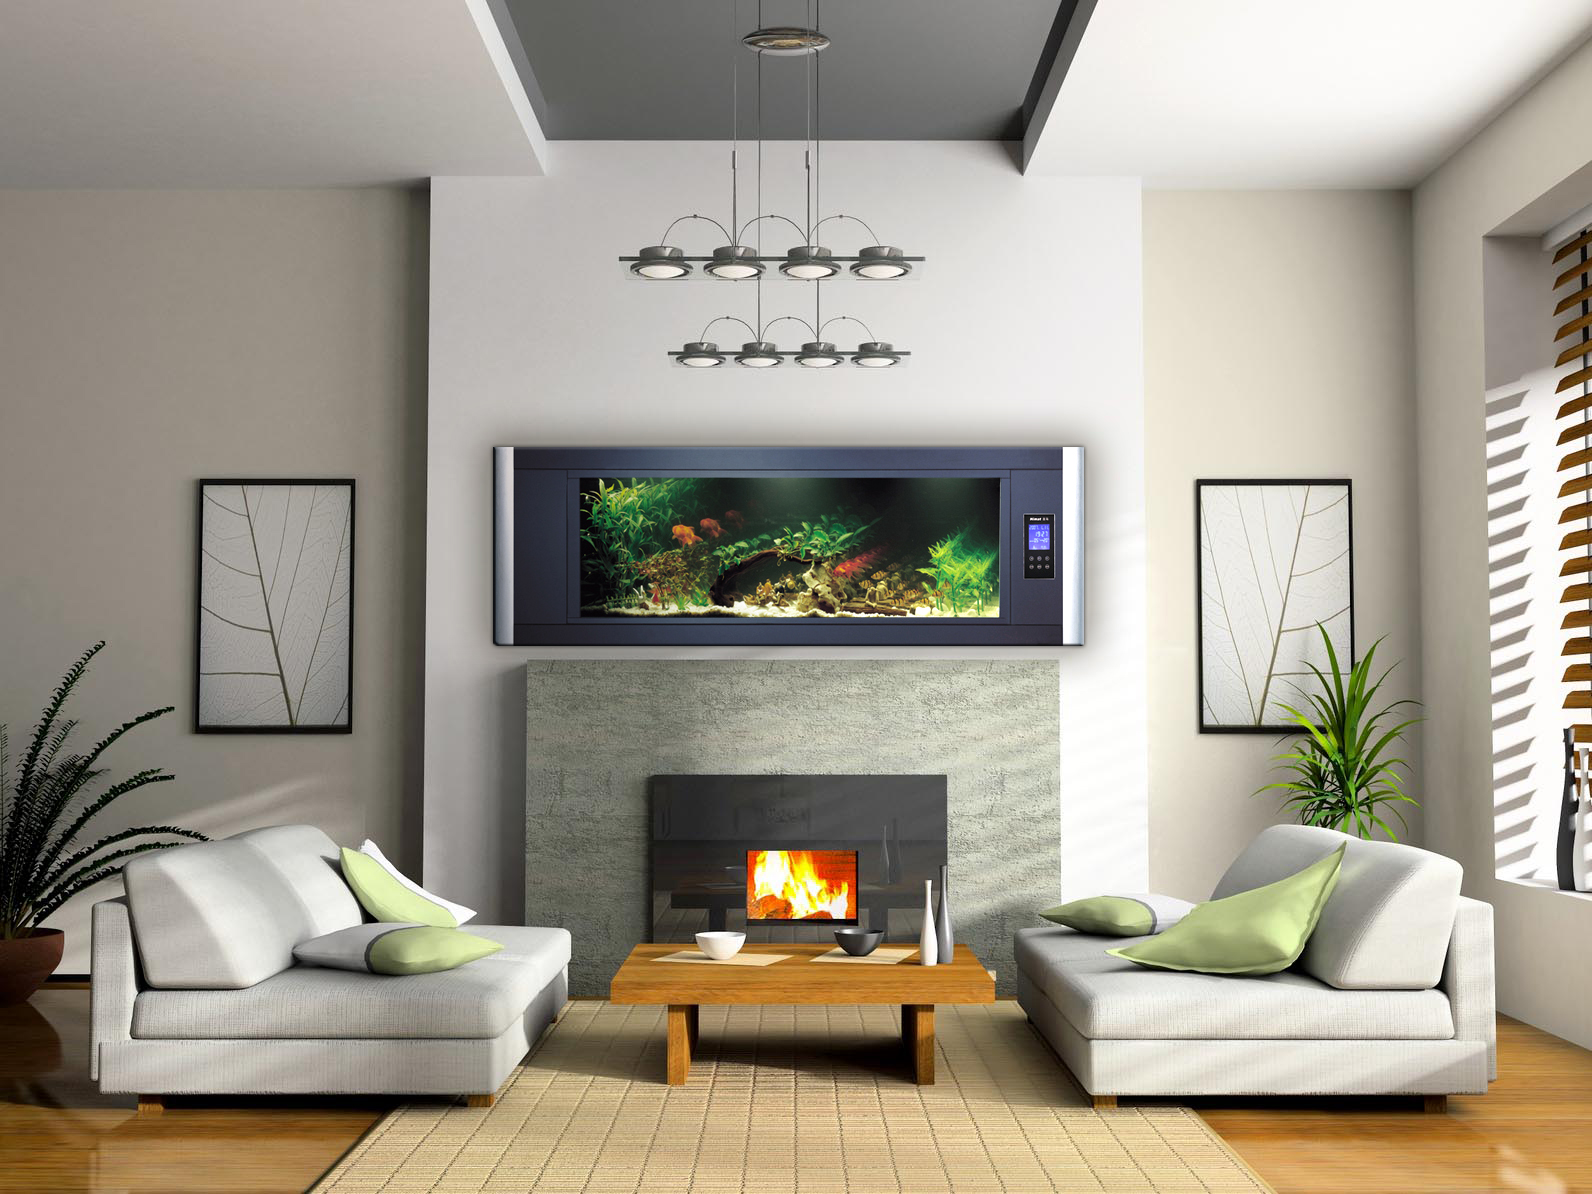 Acquari moderni acquari portal de lojas online for Acquari moderni